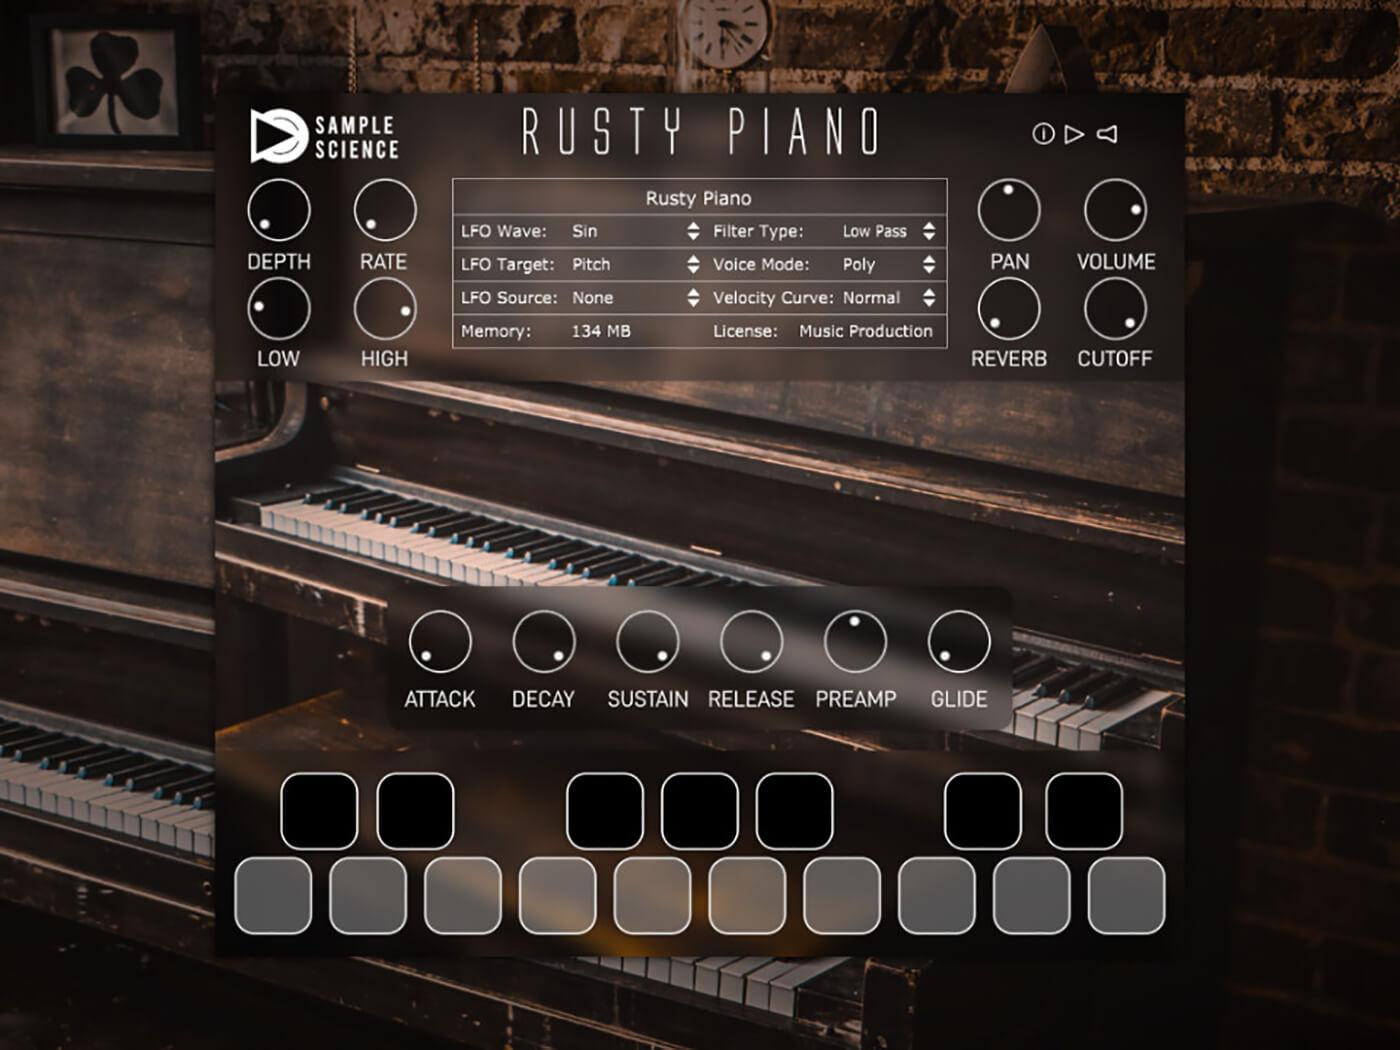 Rusty Piano